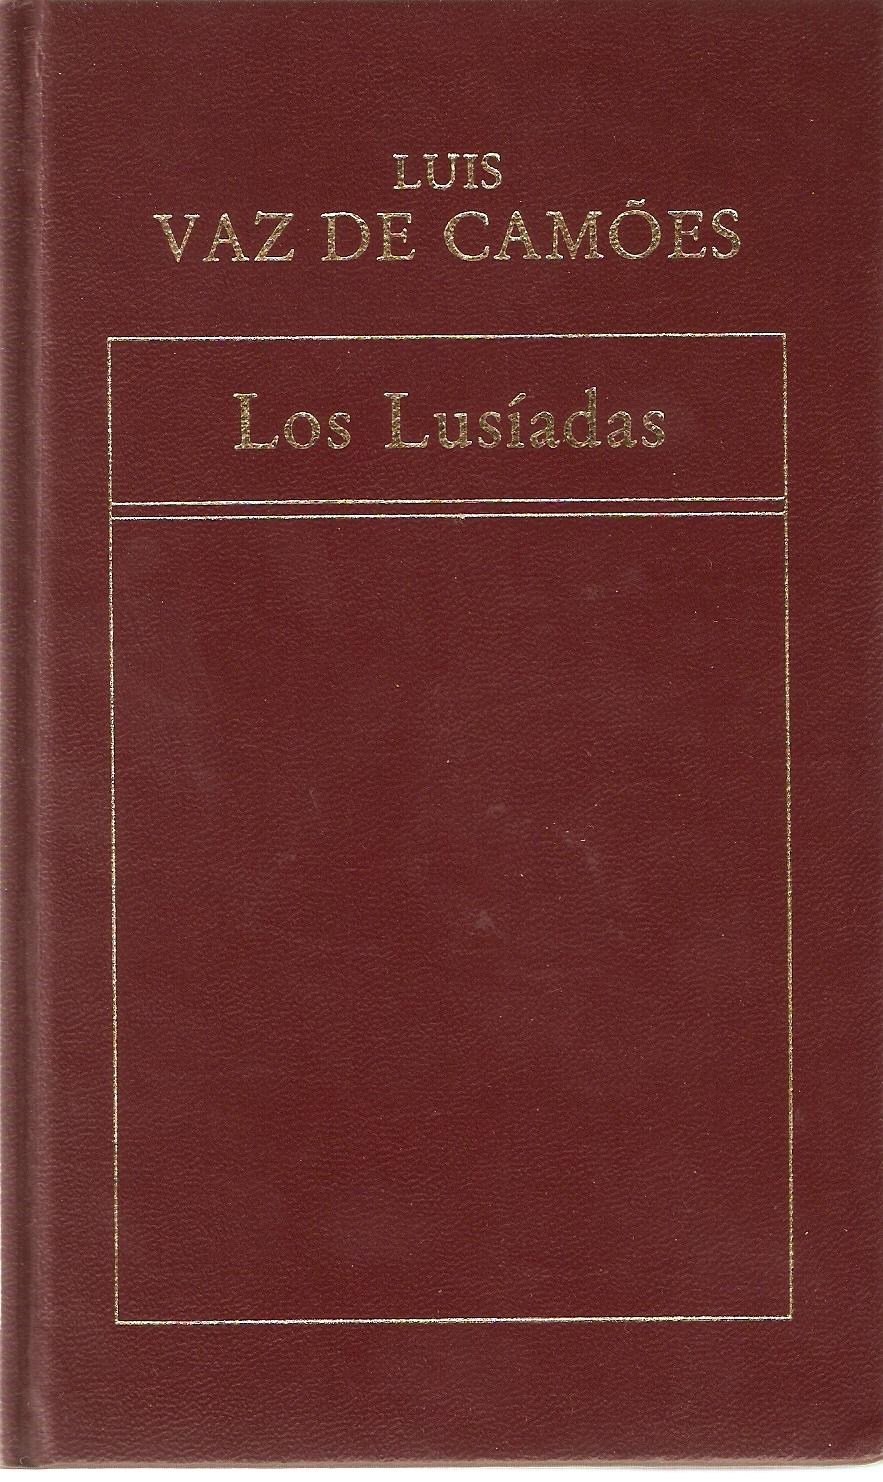 Los luísadas